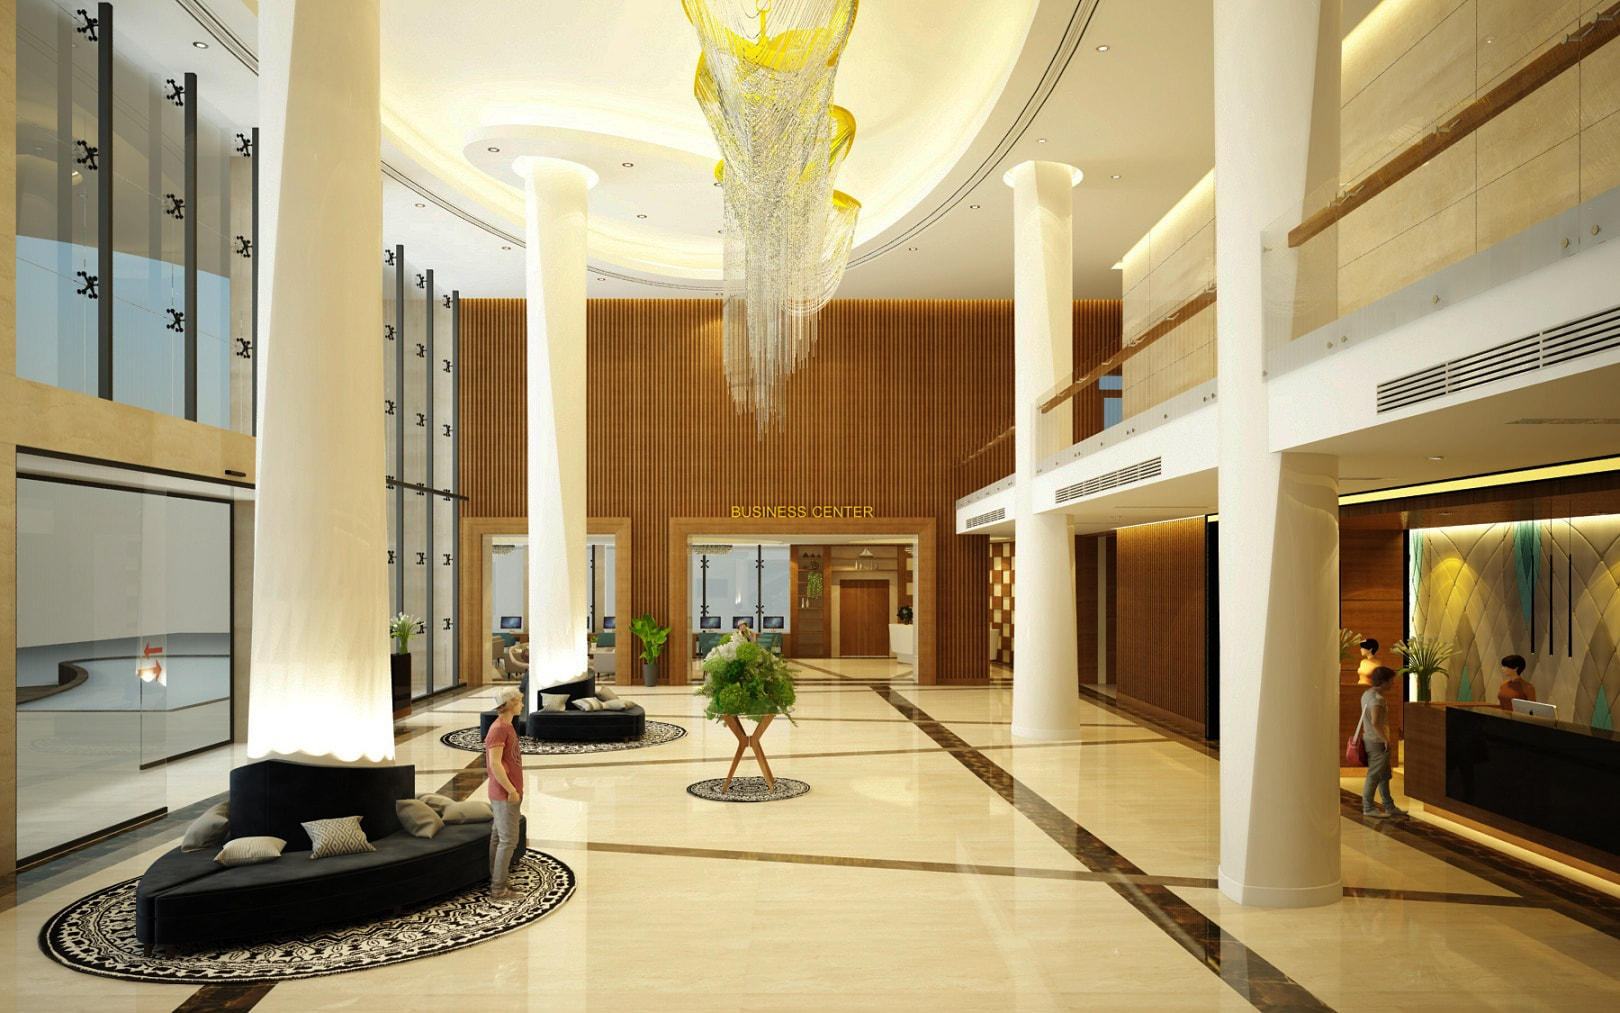 THANH UY HAI PHONG HOTEL